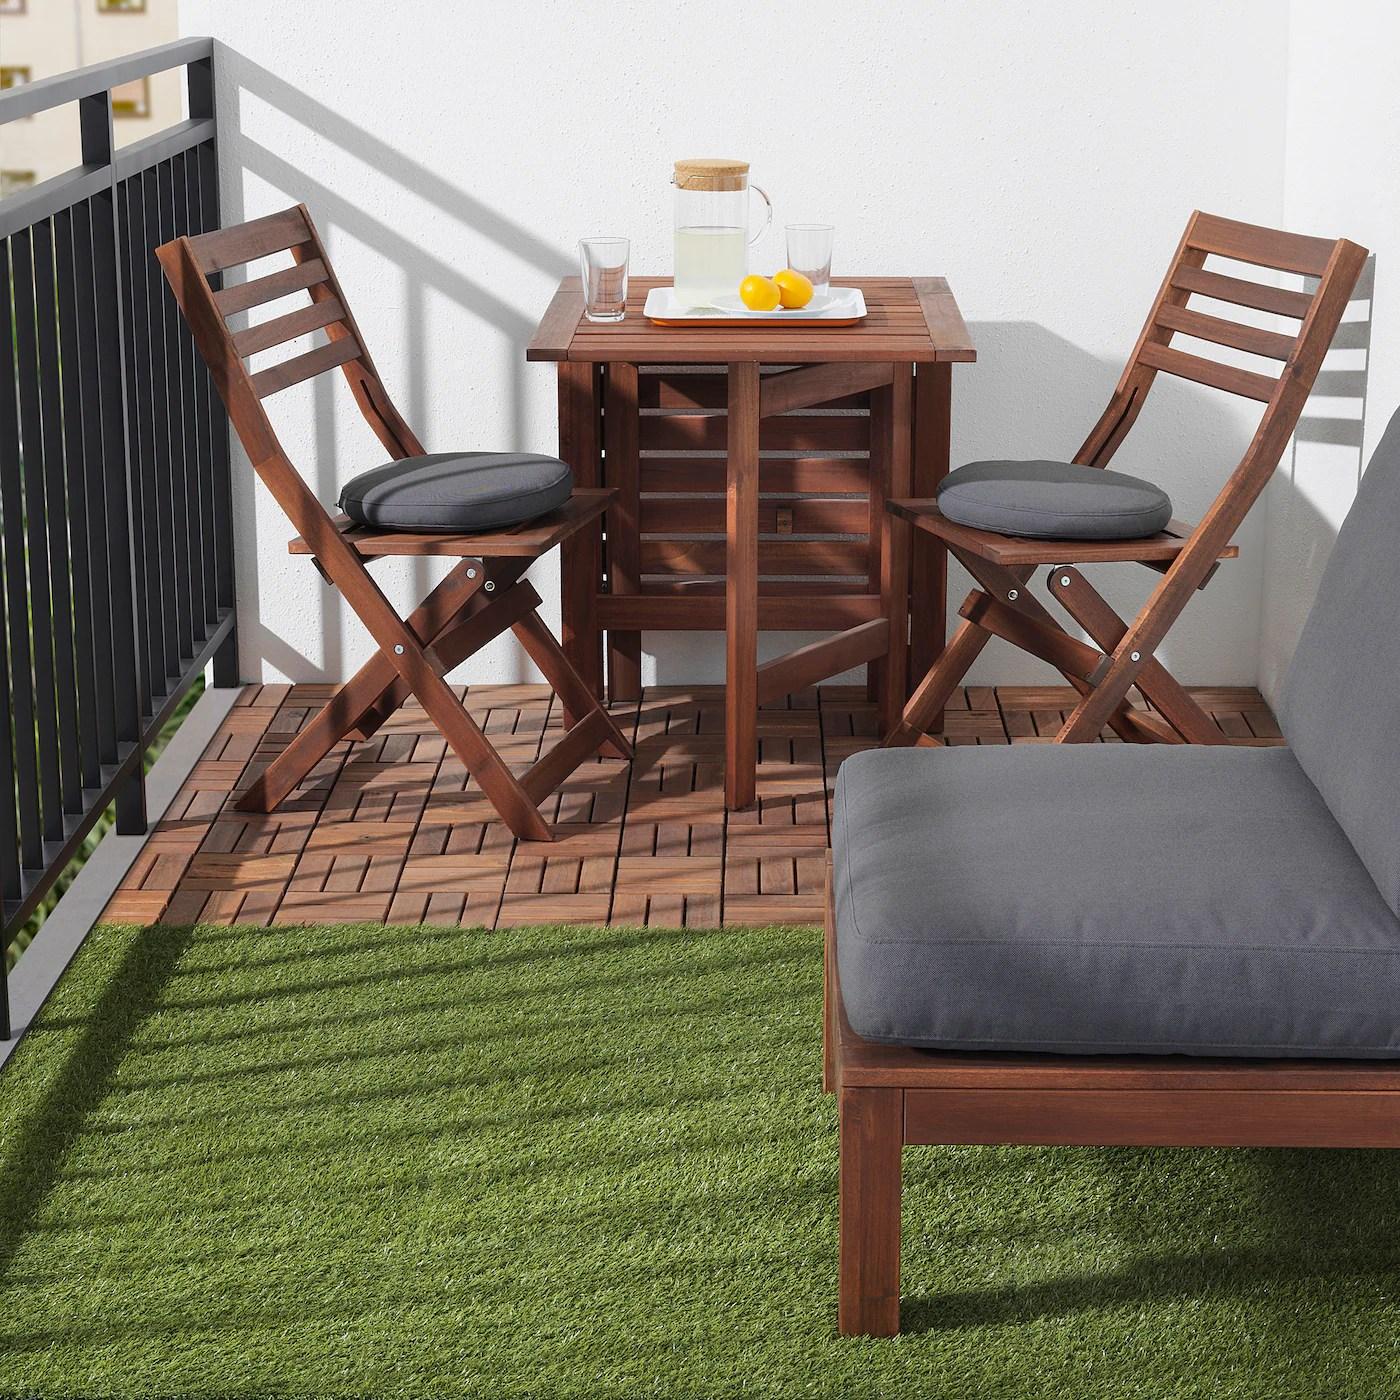 runnen decking outdoor brown stained 9 sq feet